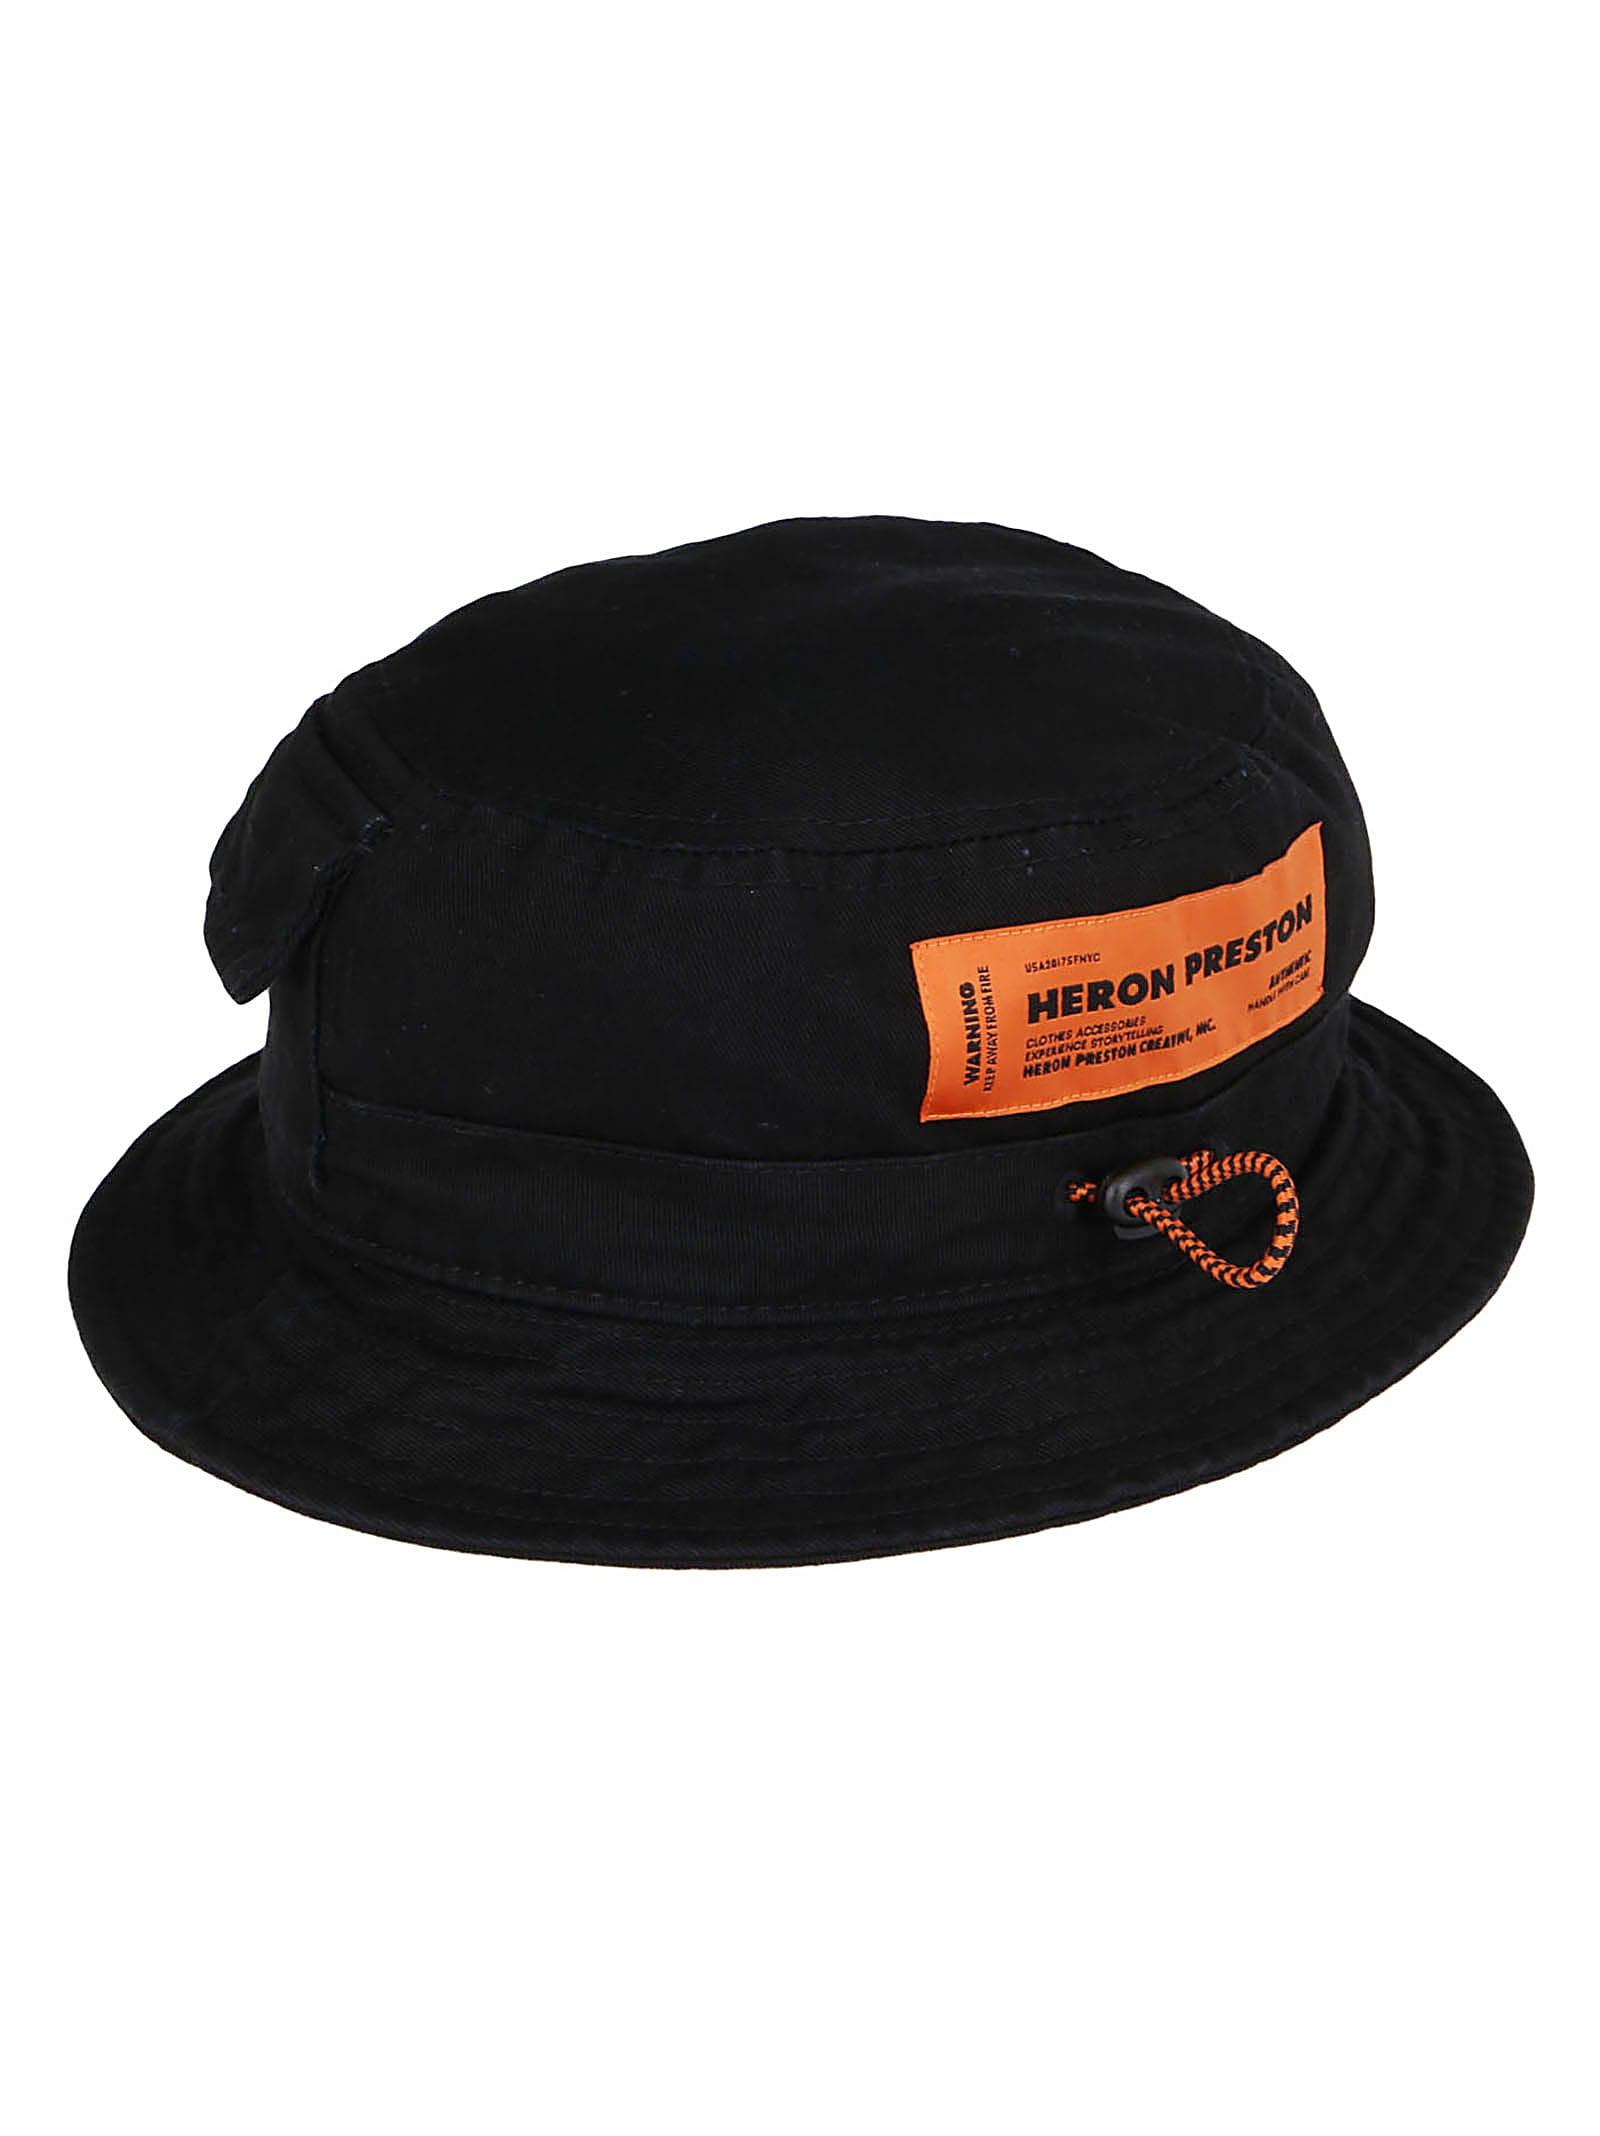 HERON PRESTON Black Cotton Bucket Hat